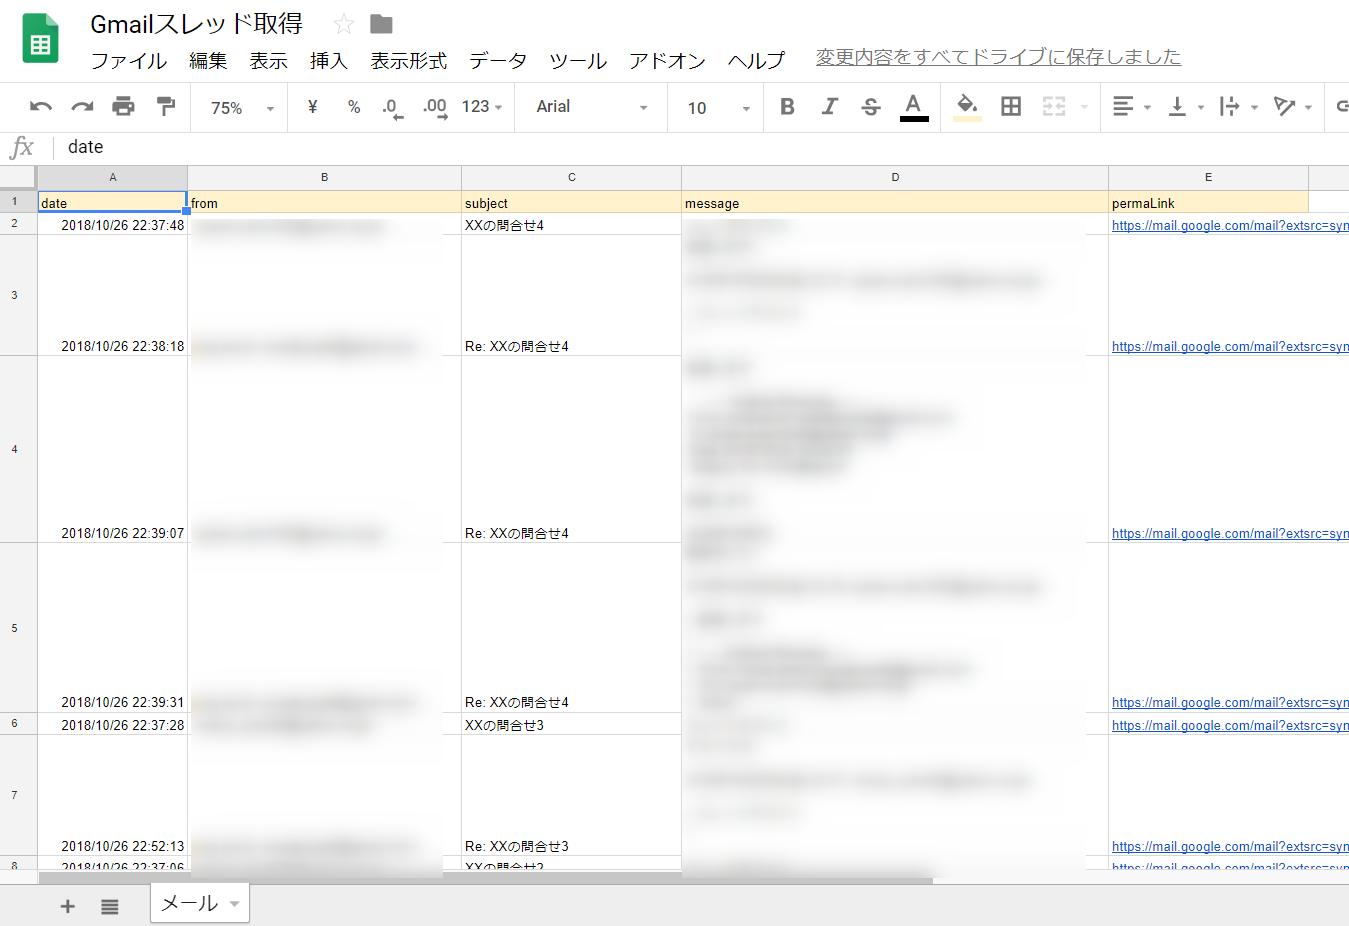 Gmailスレッド取得結果